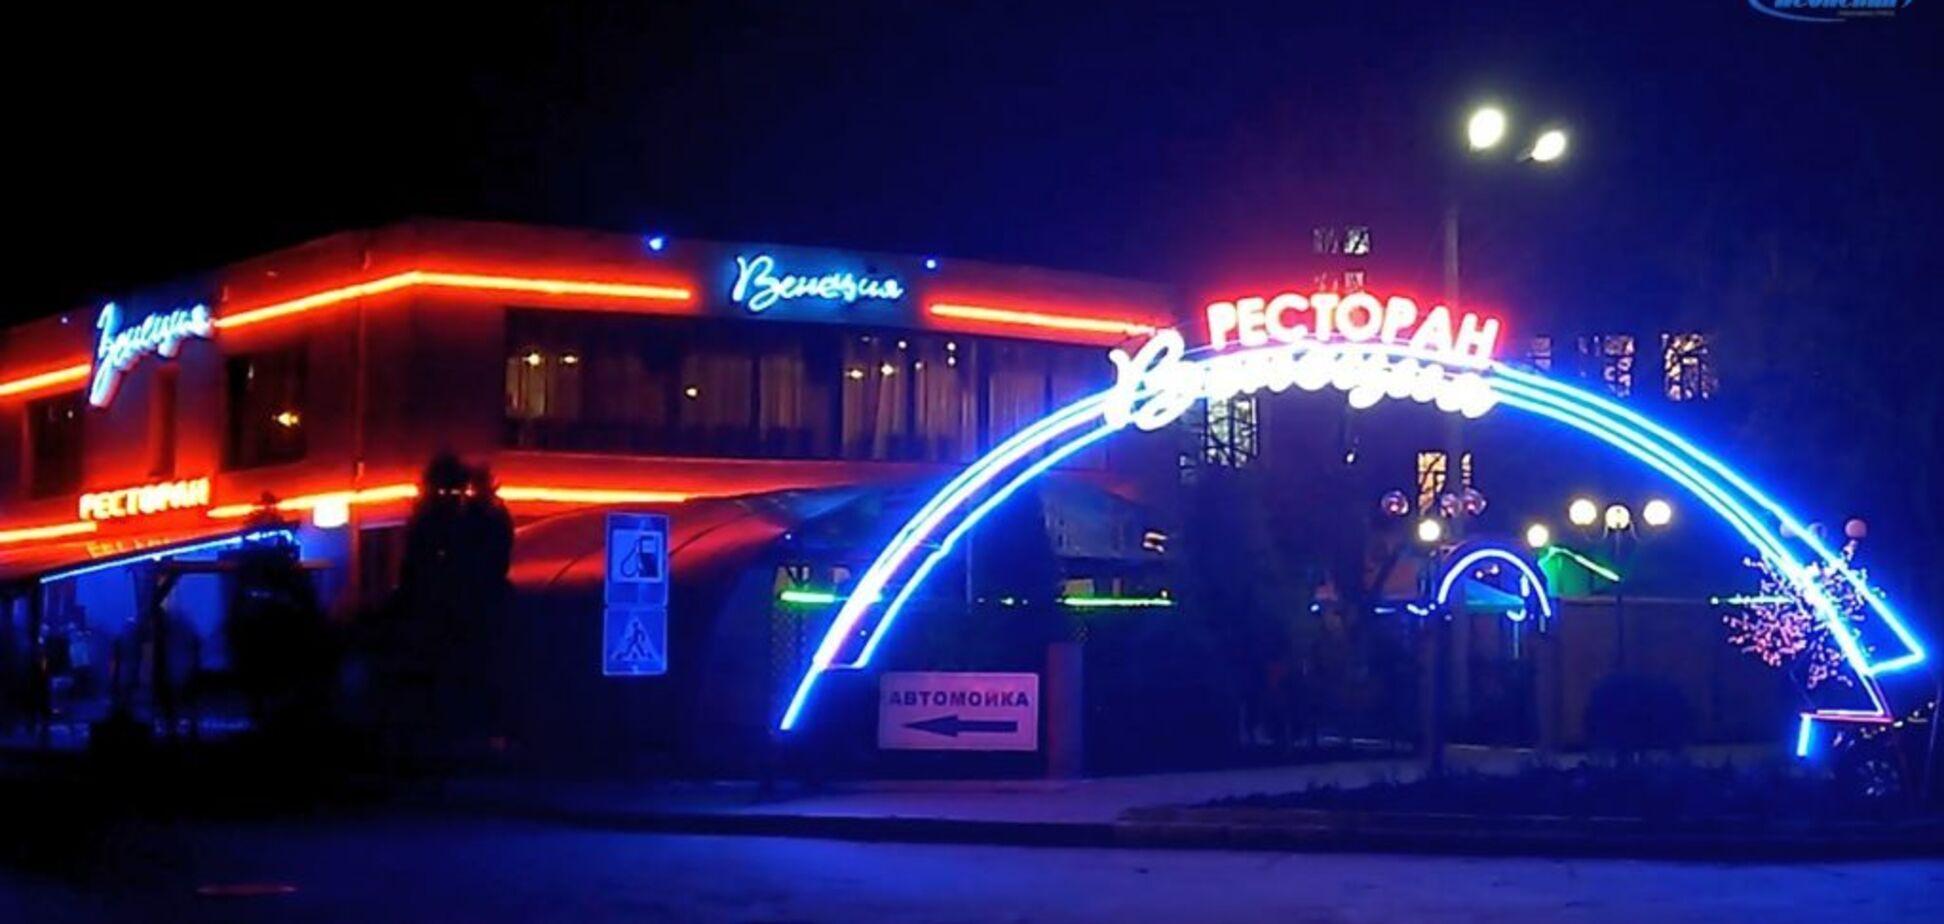 В Запорожье клиент тяжело ранил хозяина ресторана: все детали